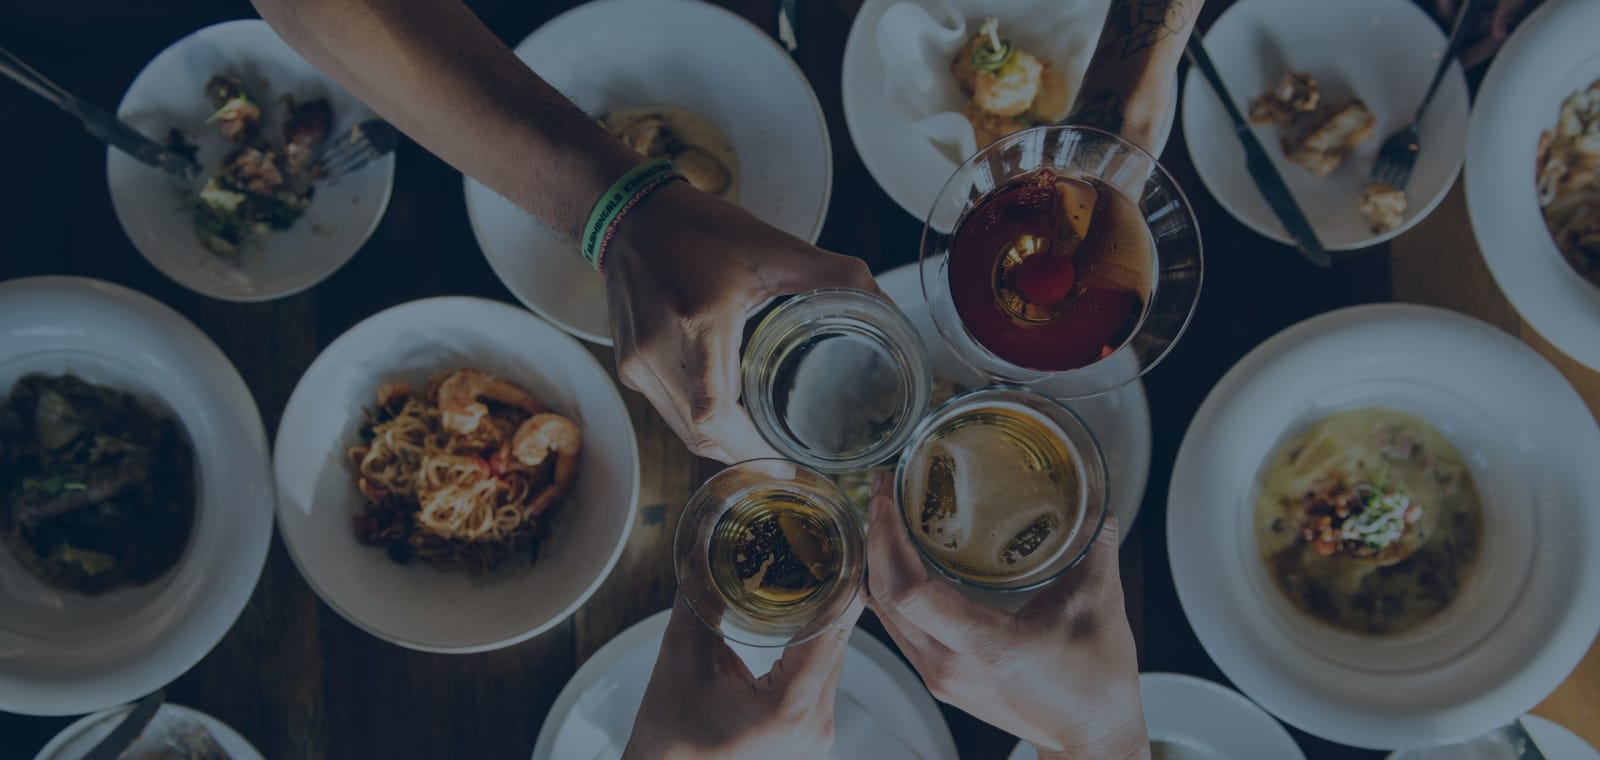 Response Food & Beverage